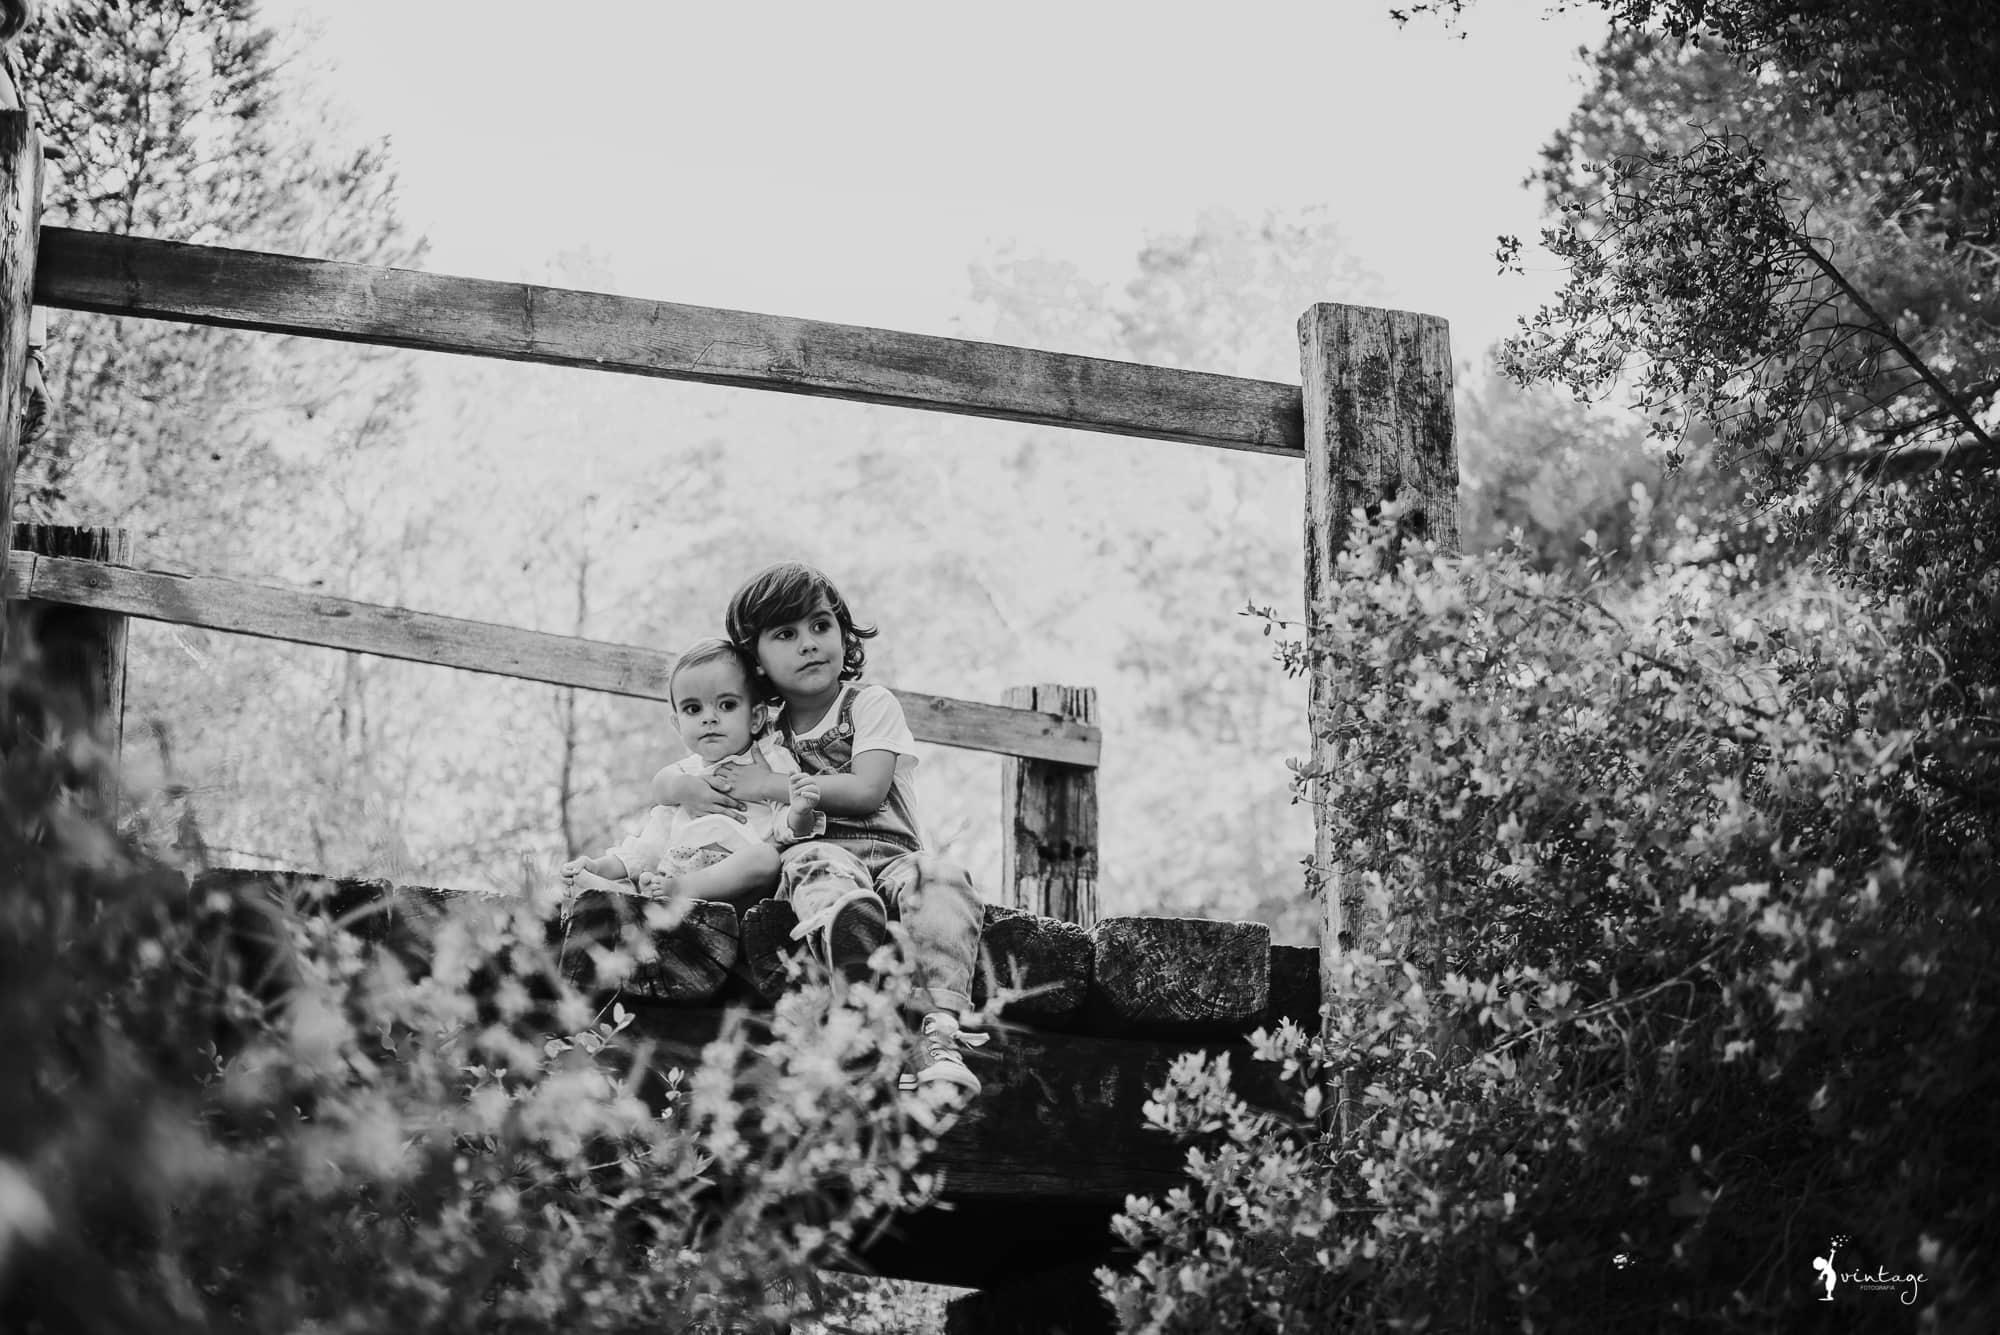 fotografo ninos book en exteriores valencia vintage fotografia toni lara